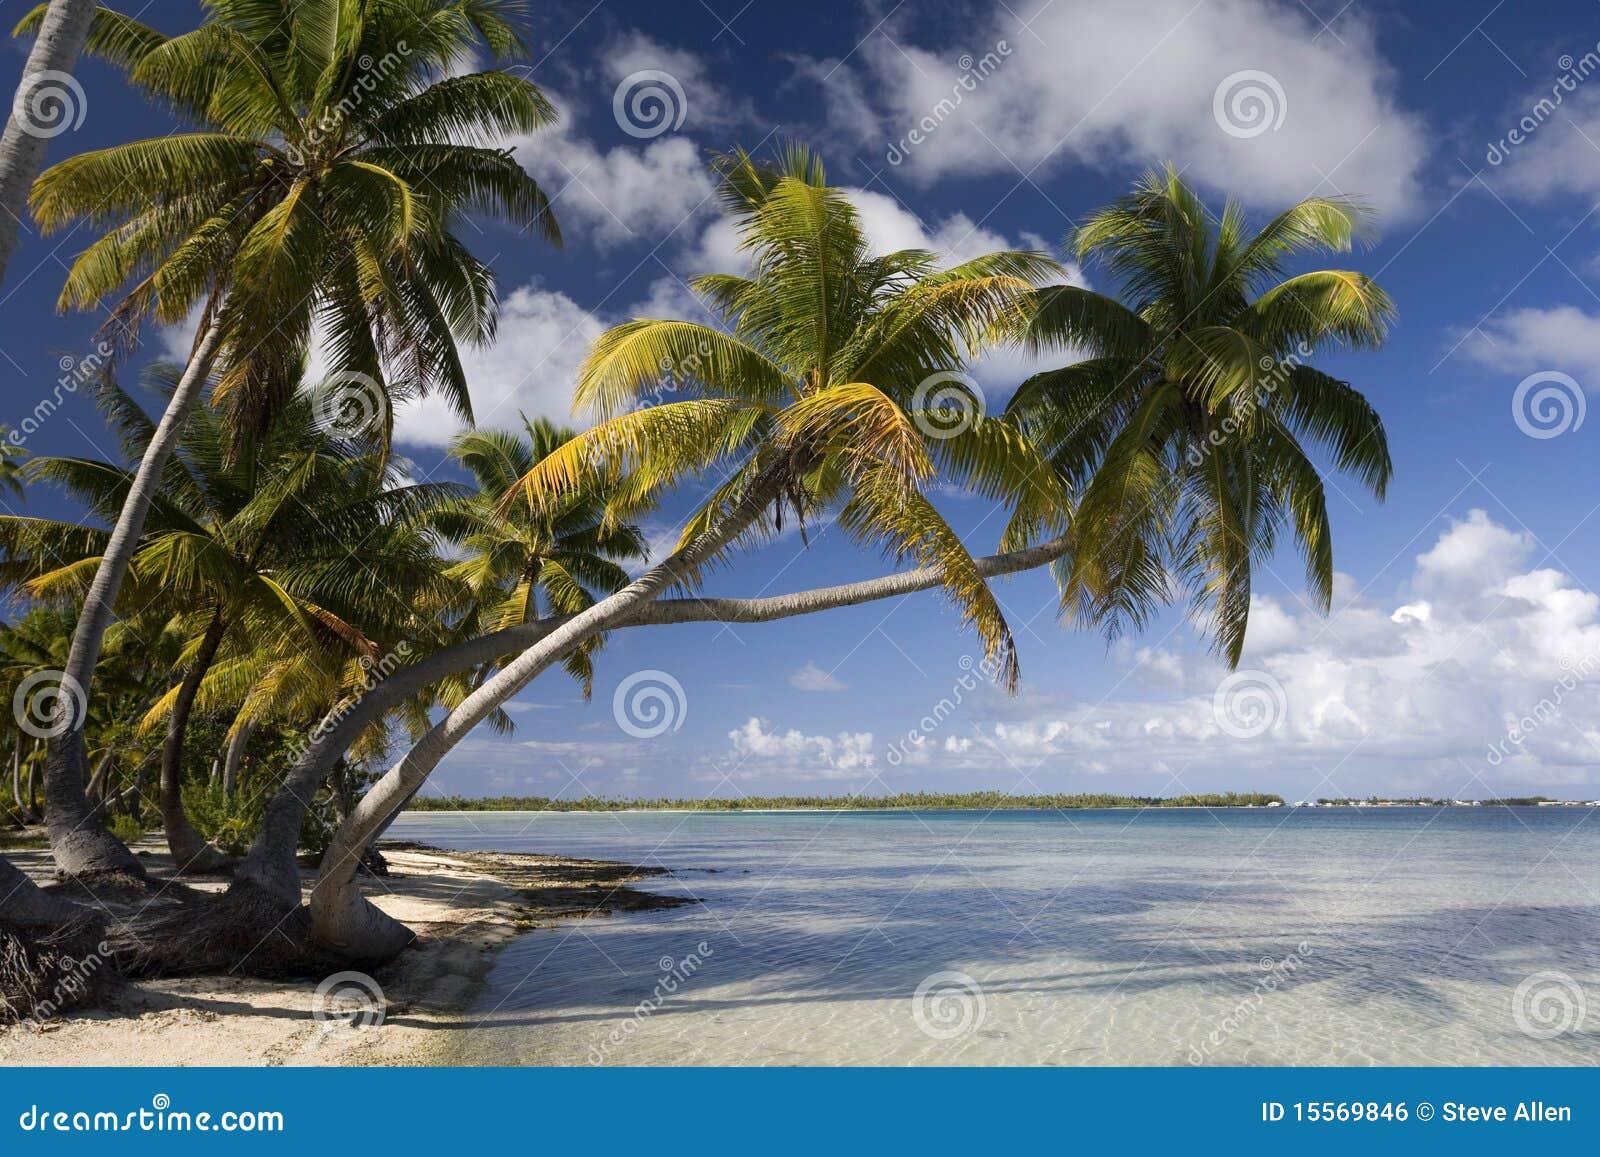 Tropical Island Paradise: Cook Islands Stock Photo